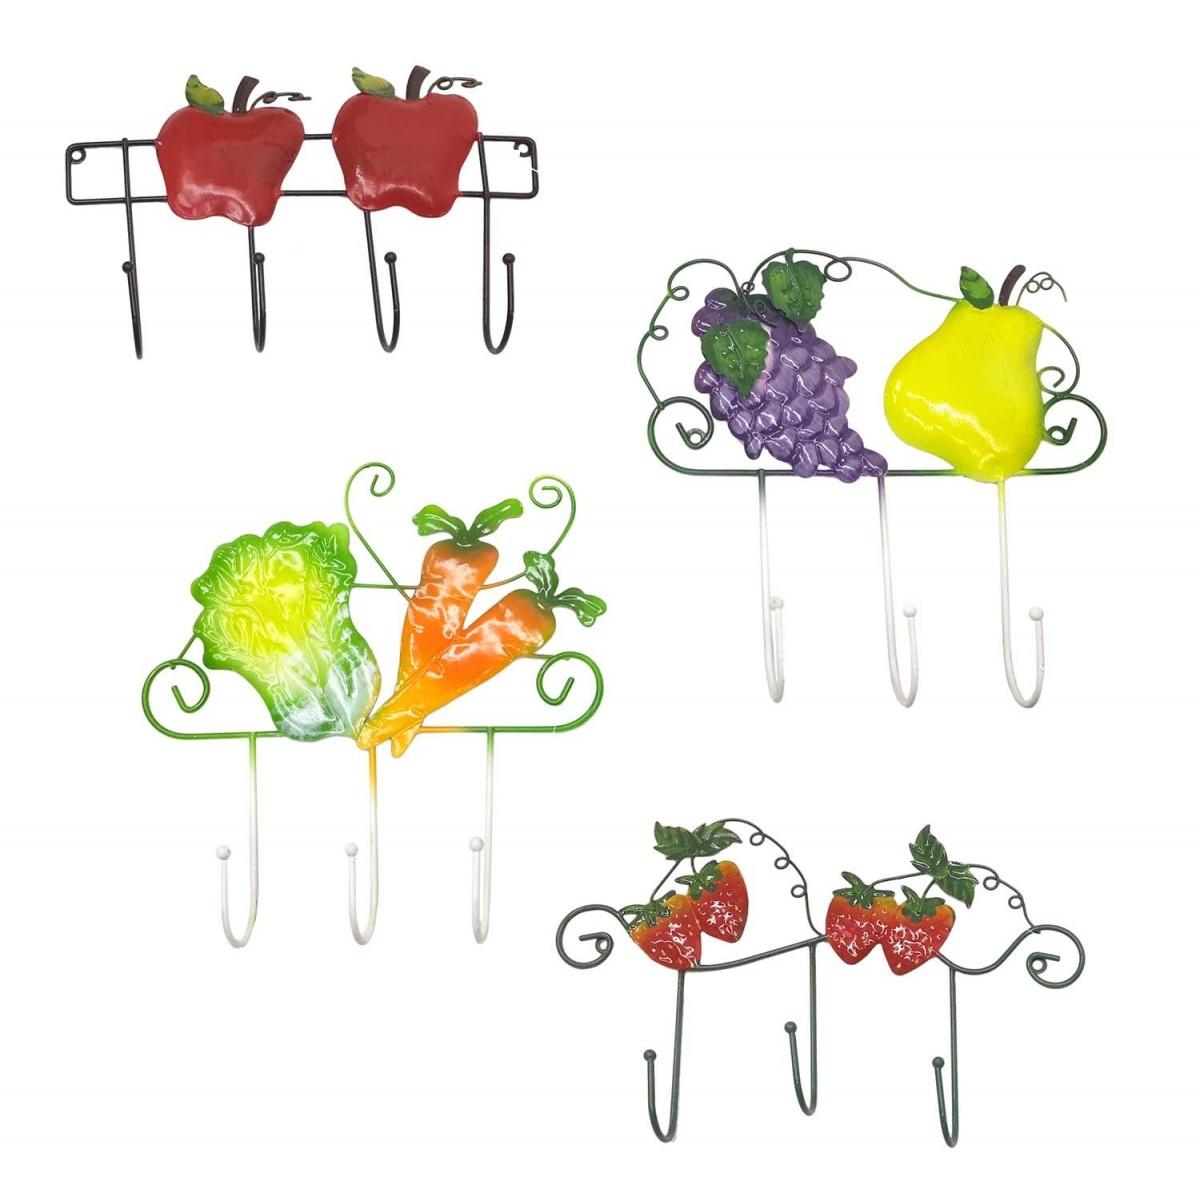 Gancho Ferro Chapeu Bolsa Bone Cozinha Jardim Enfeite Fruta Legume Pendura Kit Com 4 (pt-c-l)